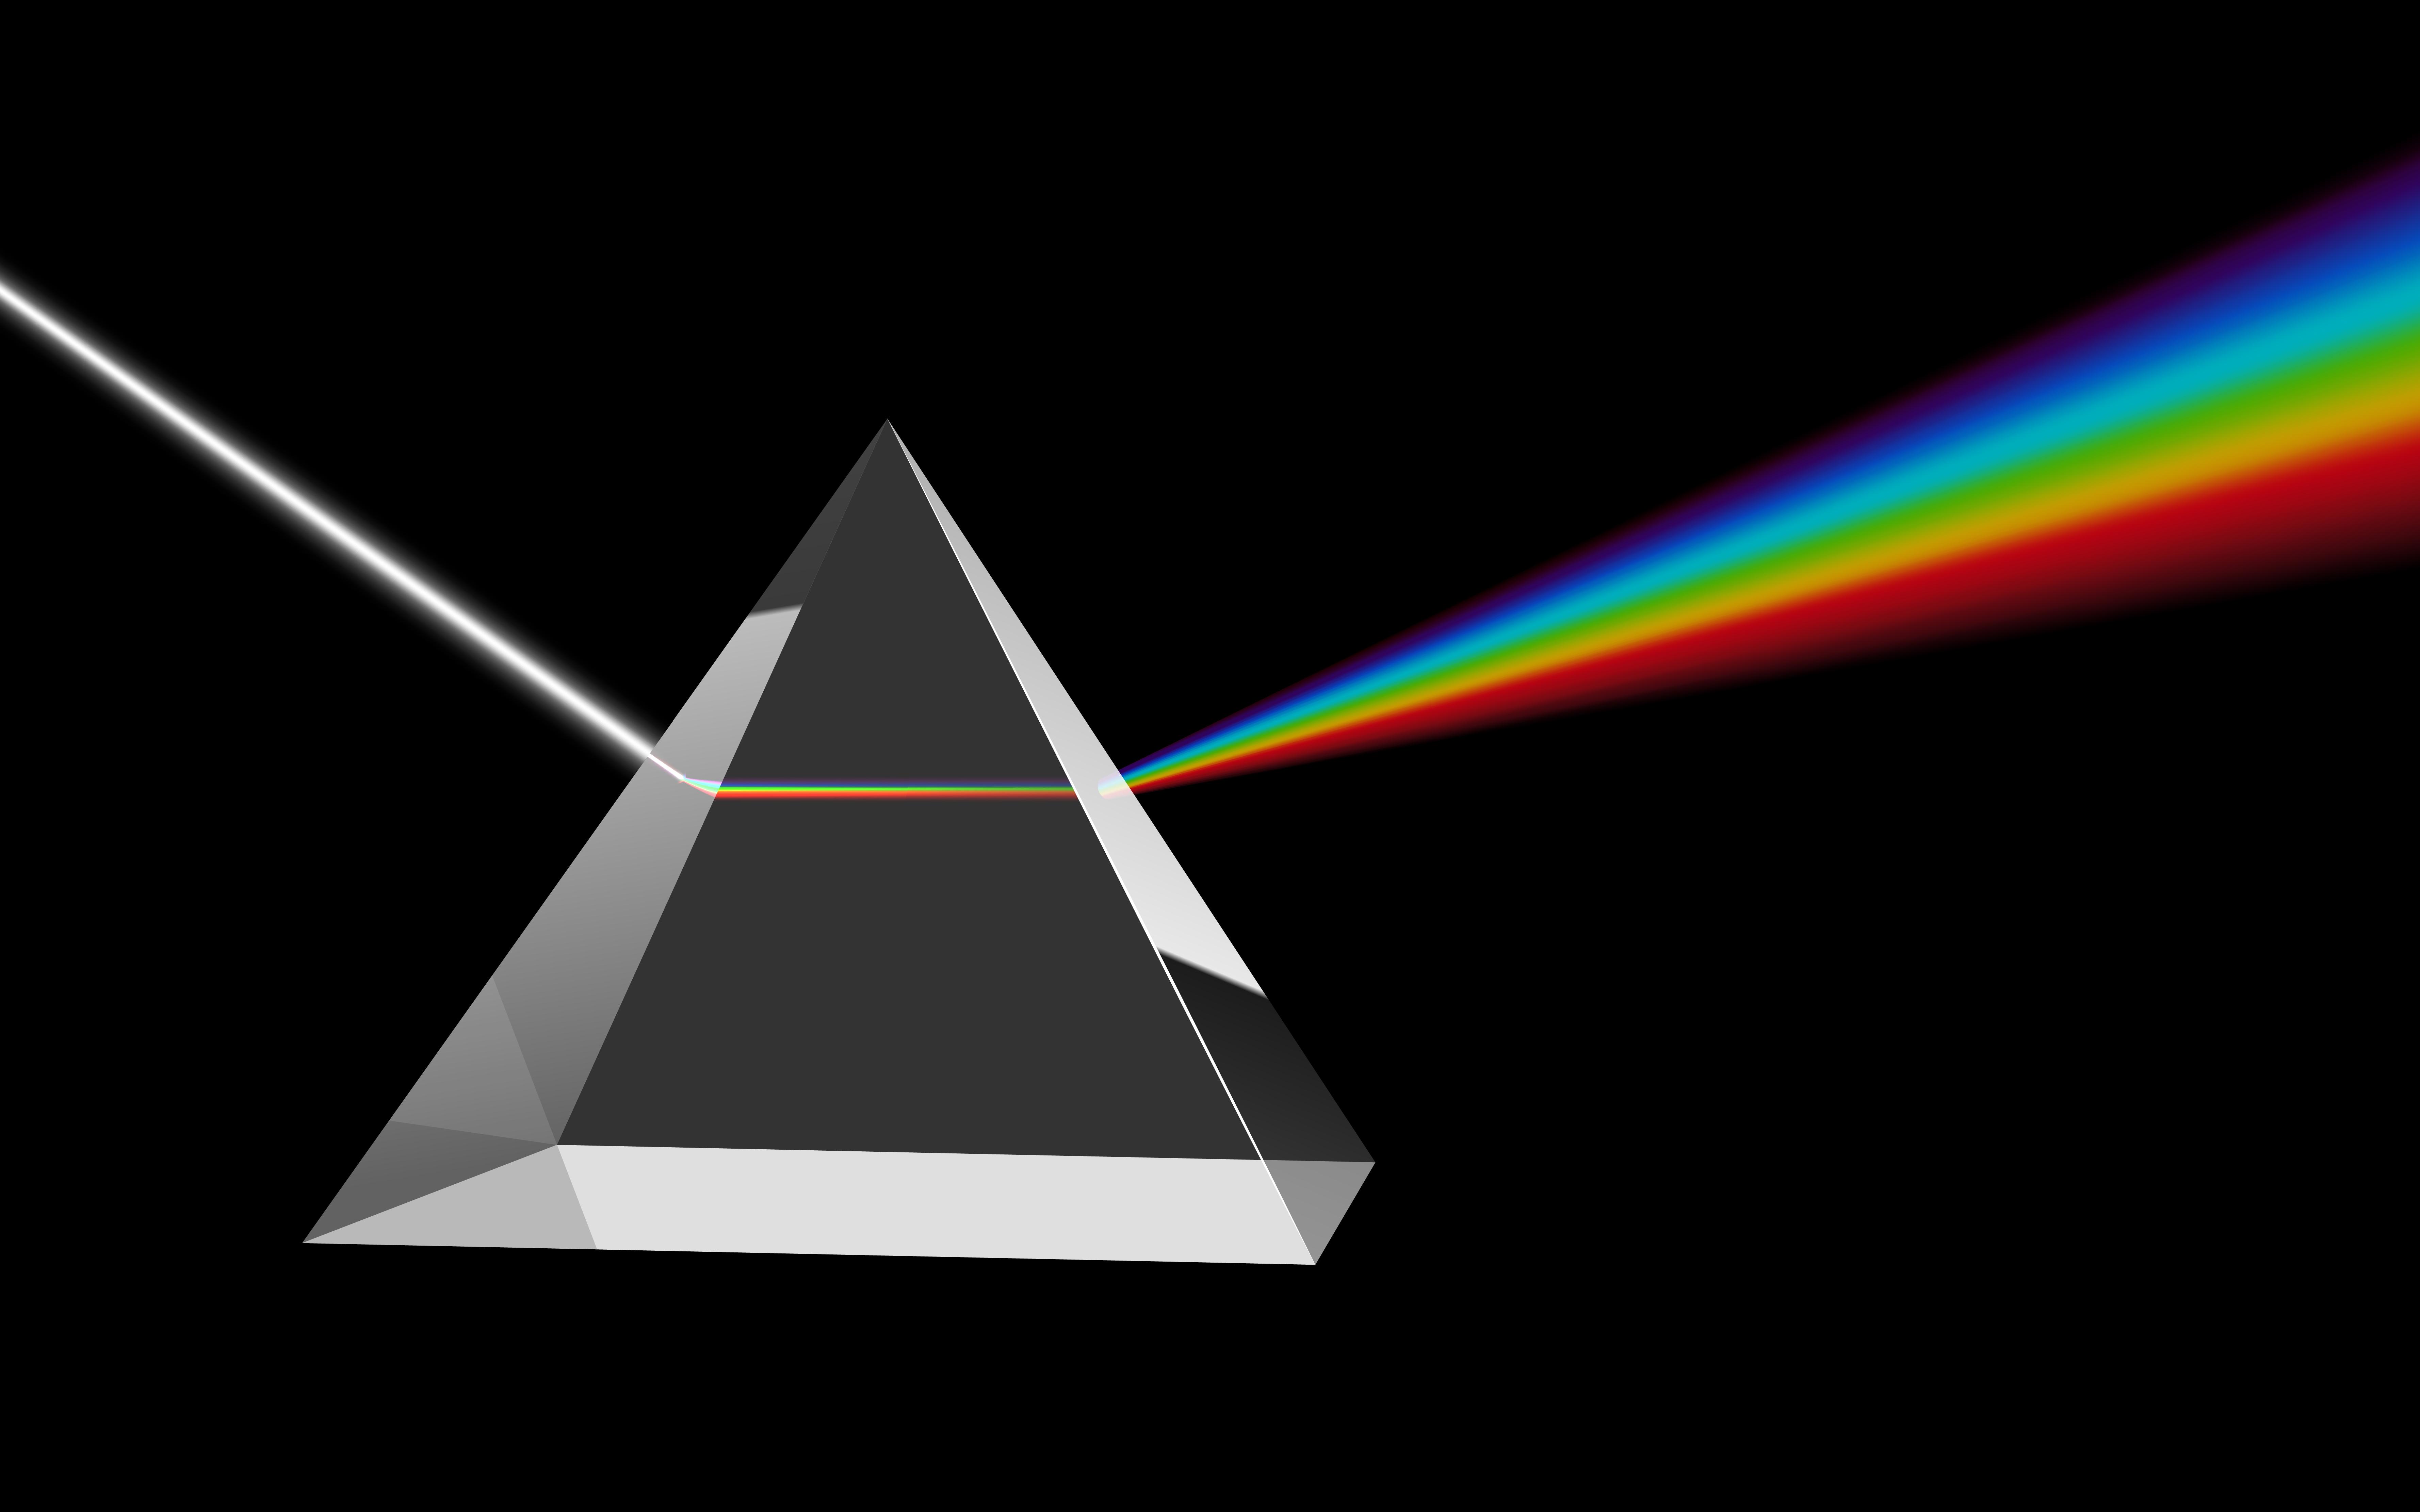 pyramid prism light rainbow dark Wiederblank Tanach ...